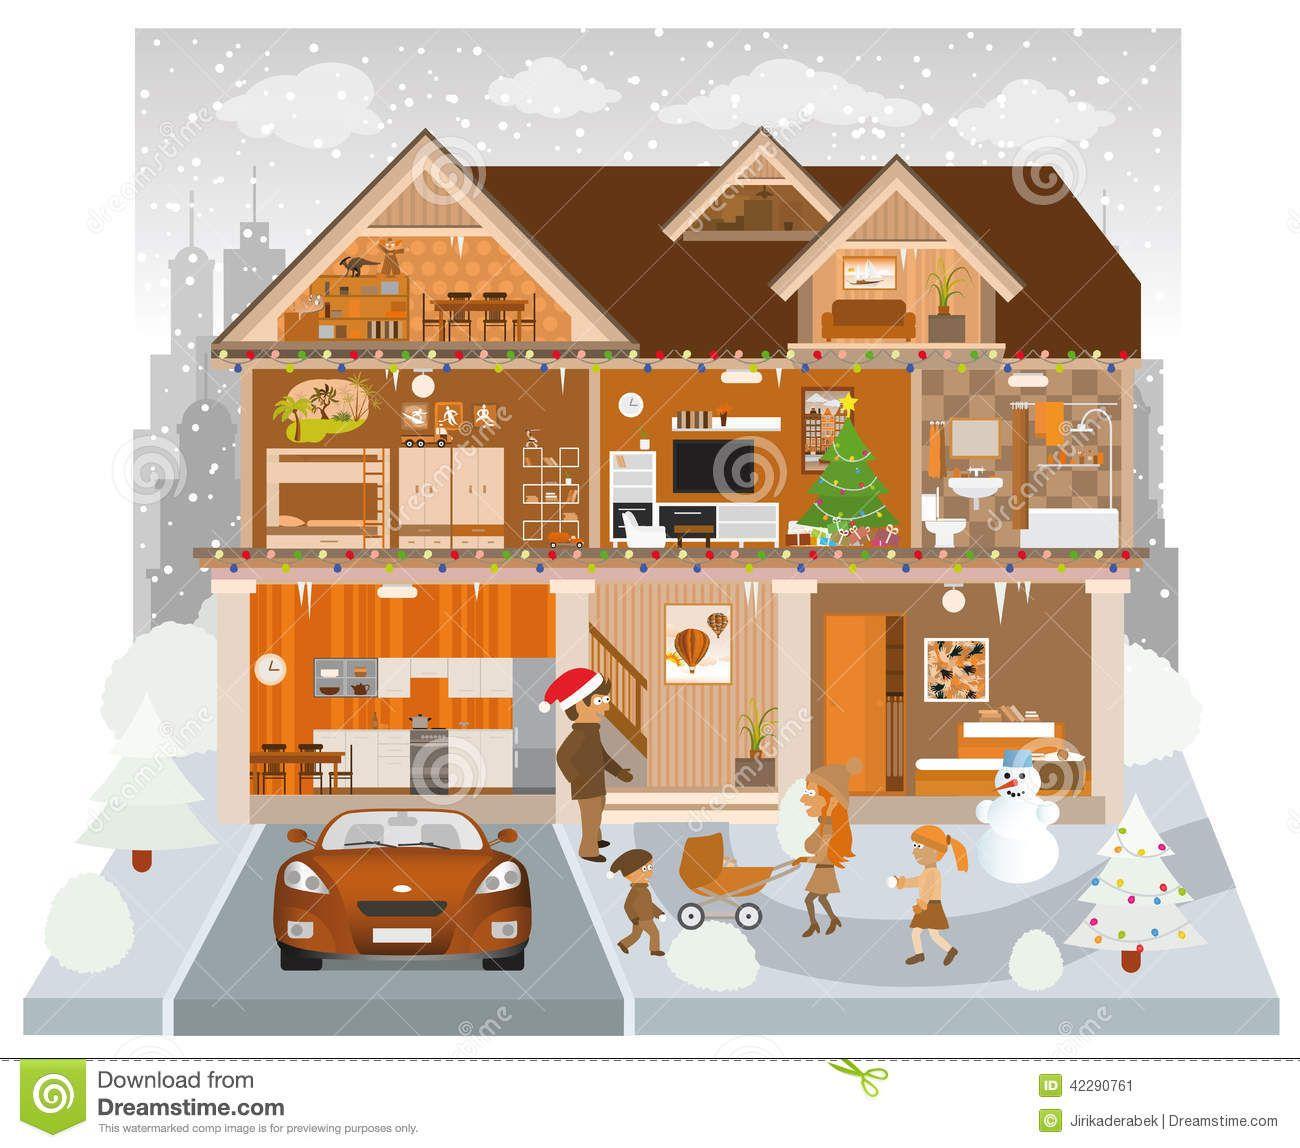 innerhalb-des-hauses-winter-42290761.jpg (1300×1148)